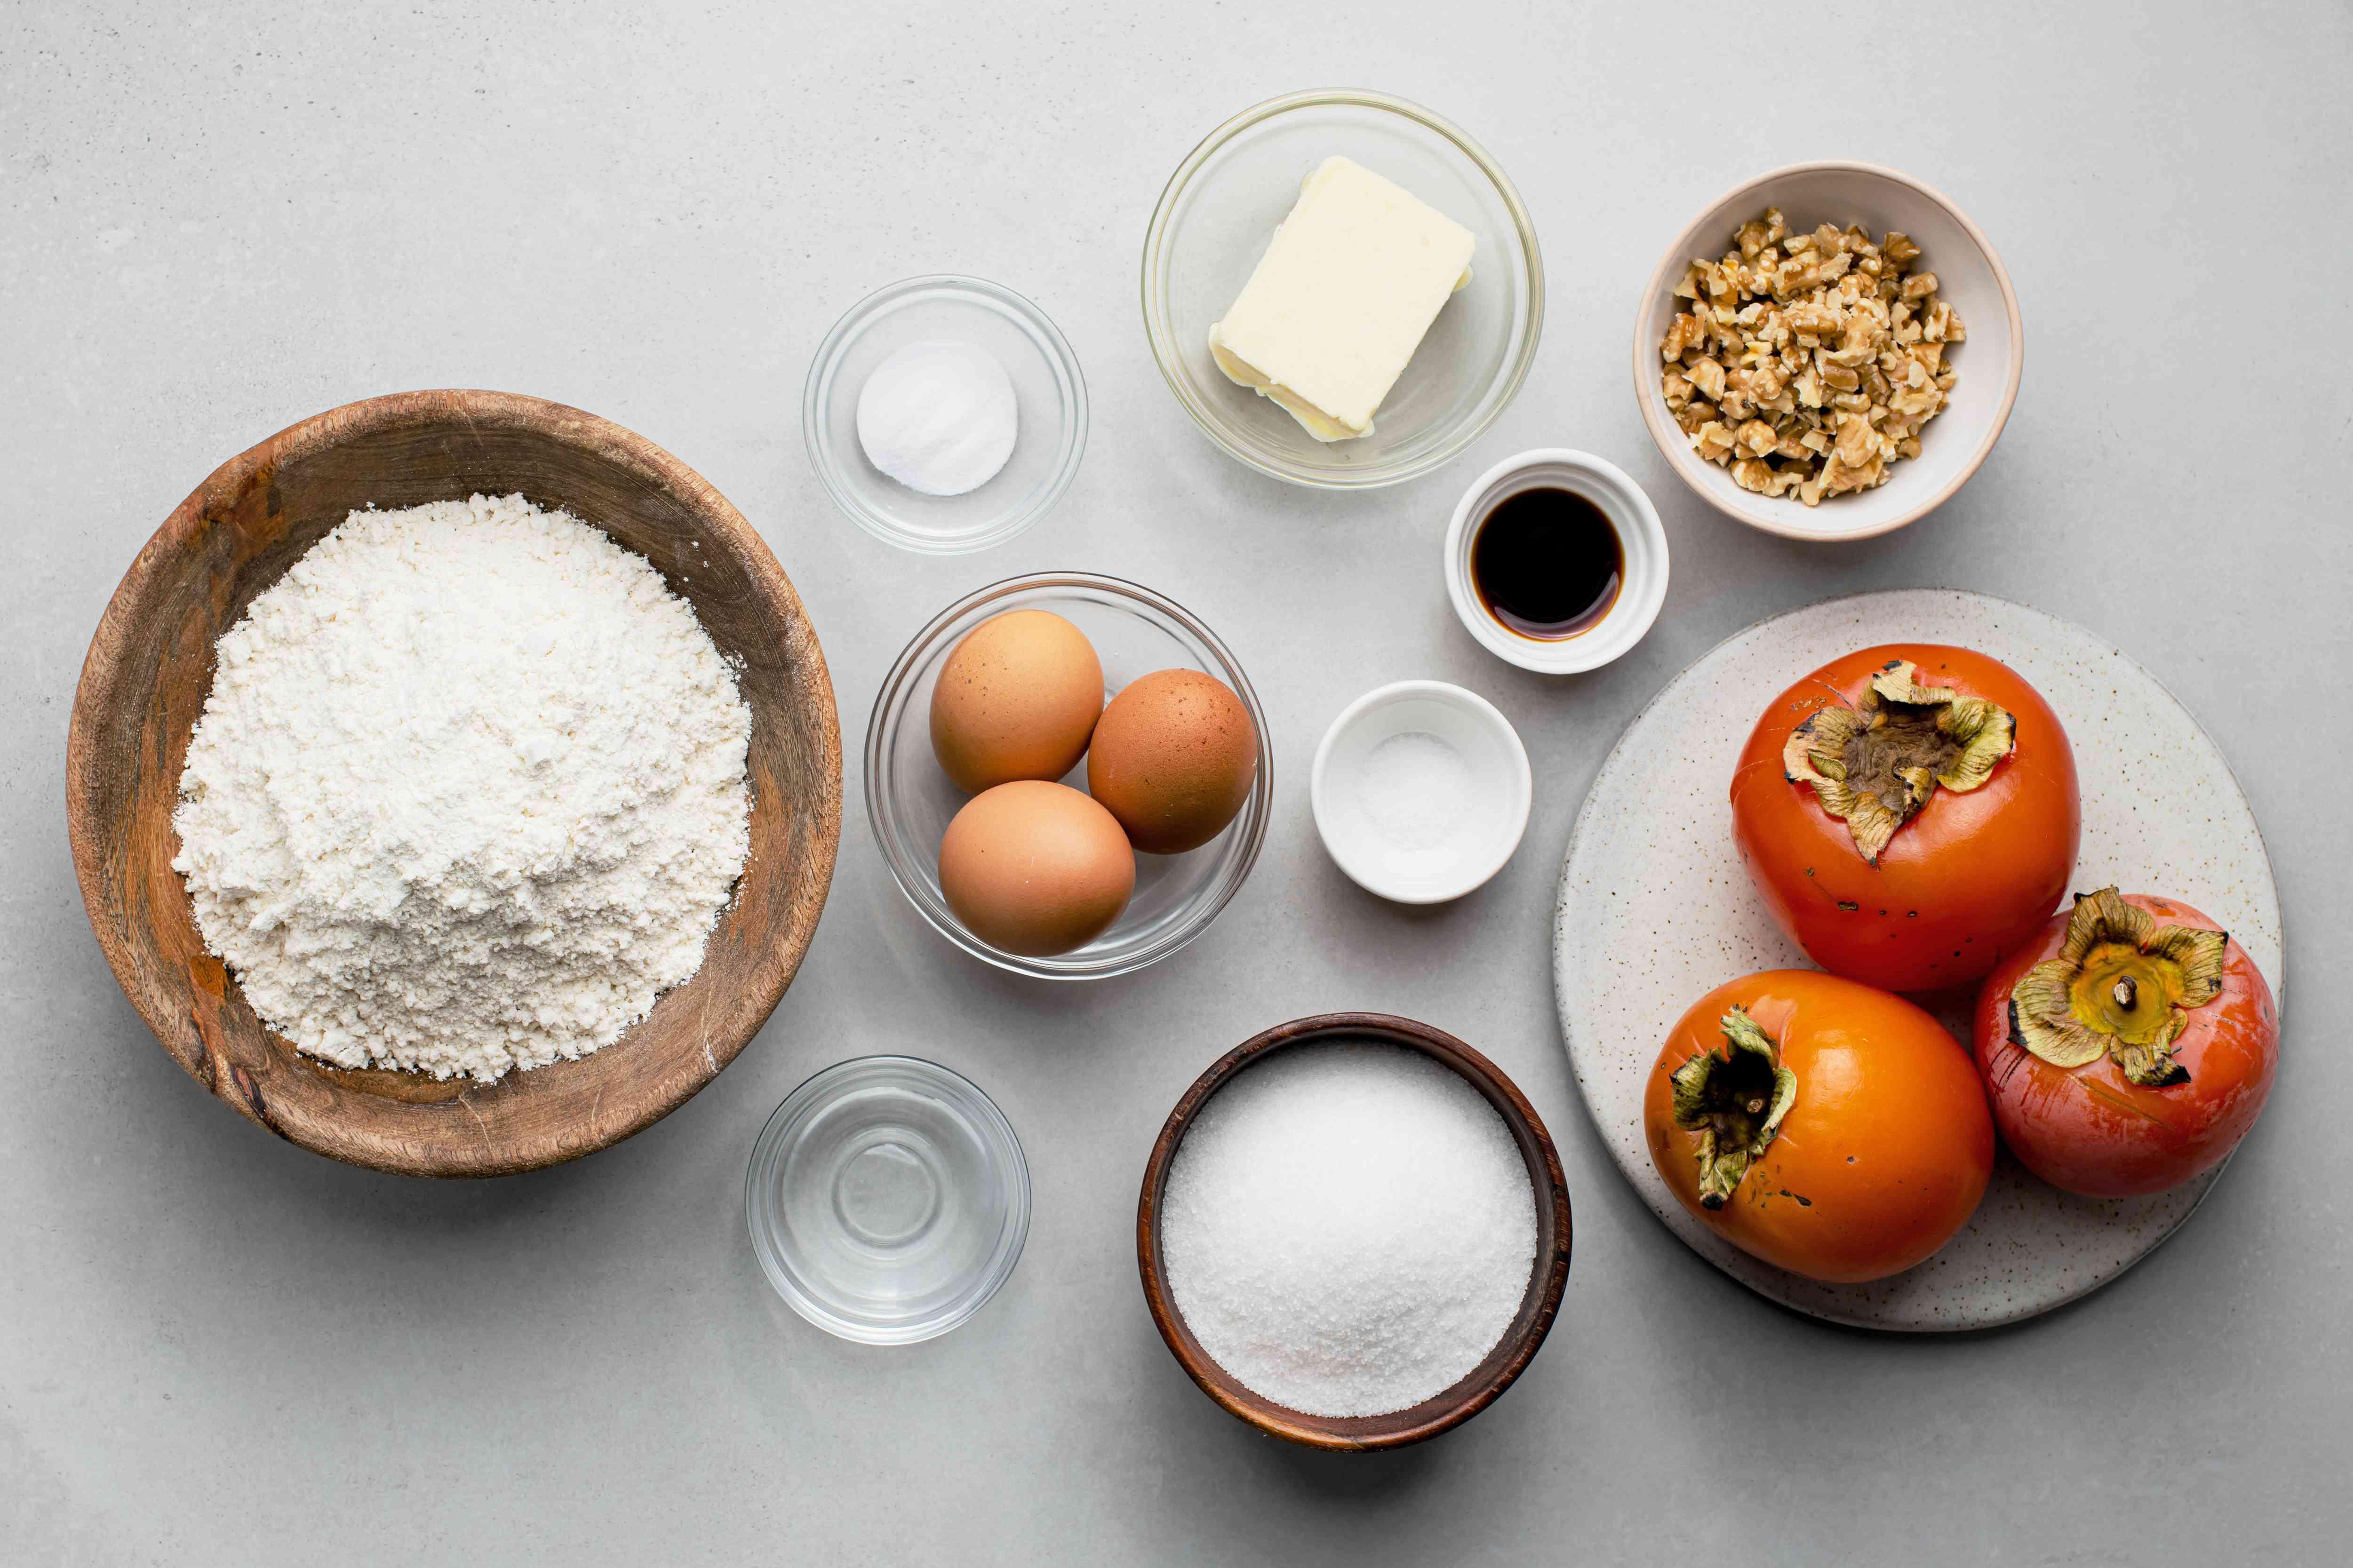 Easy Persimmon Quick Bread ingredients